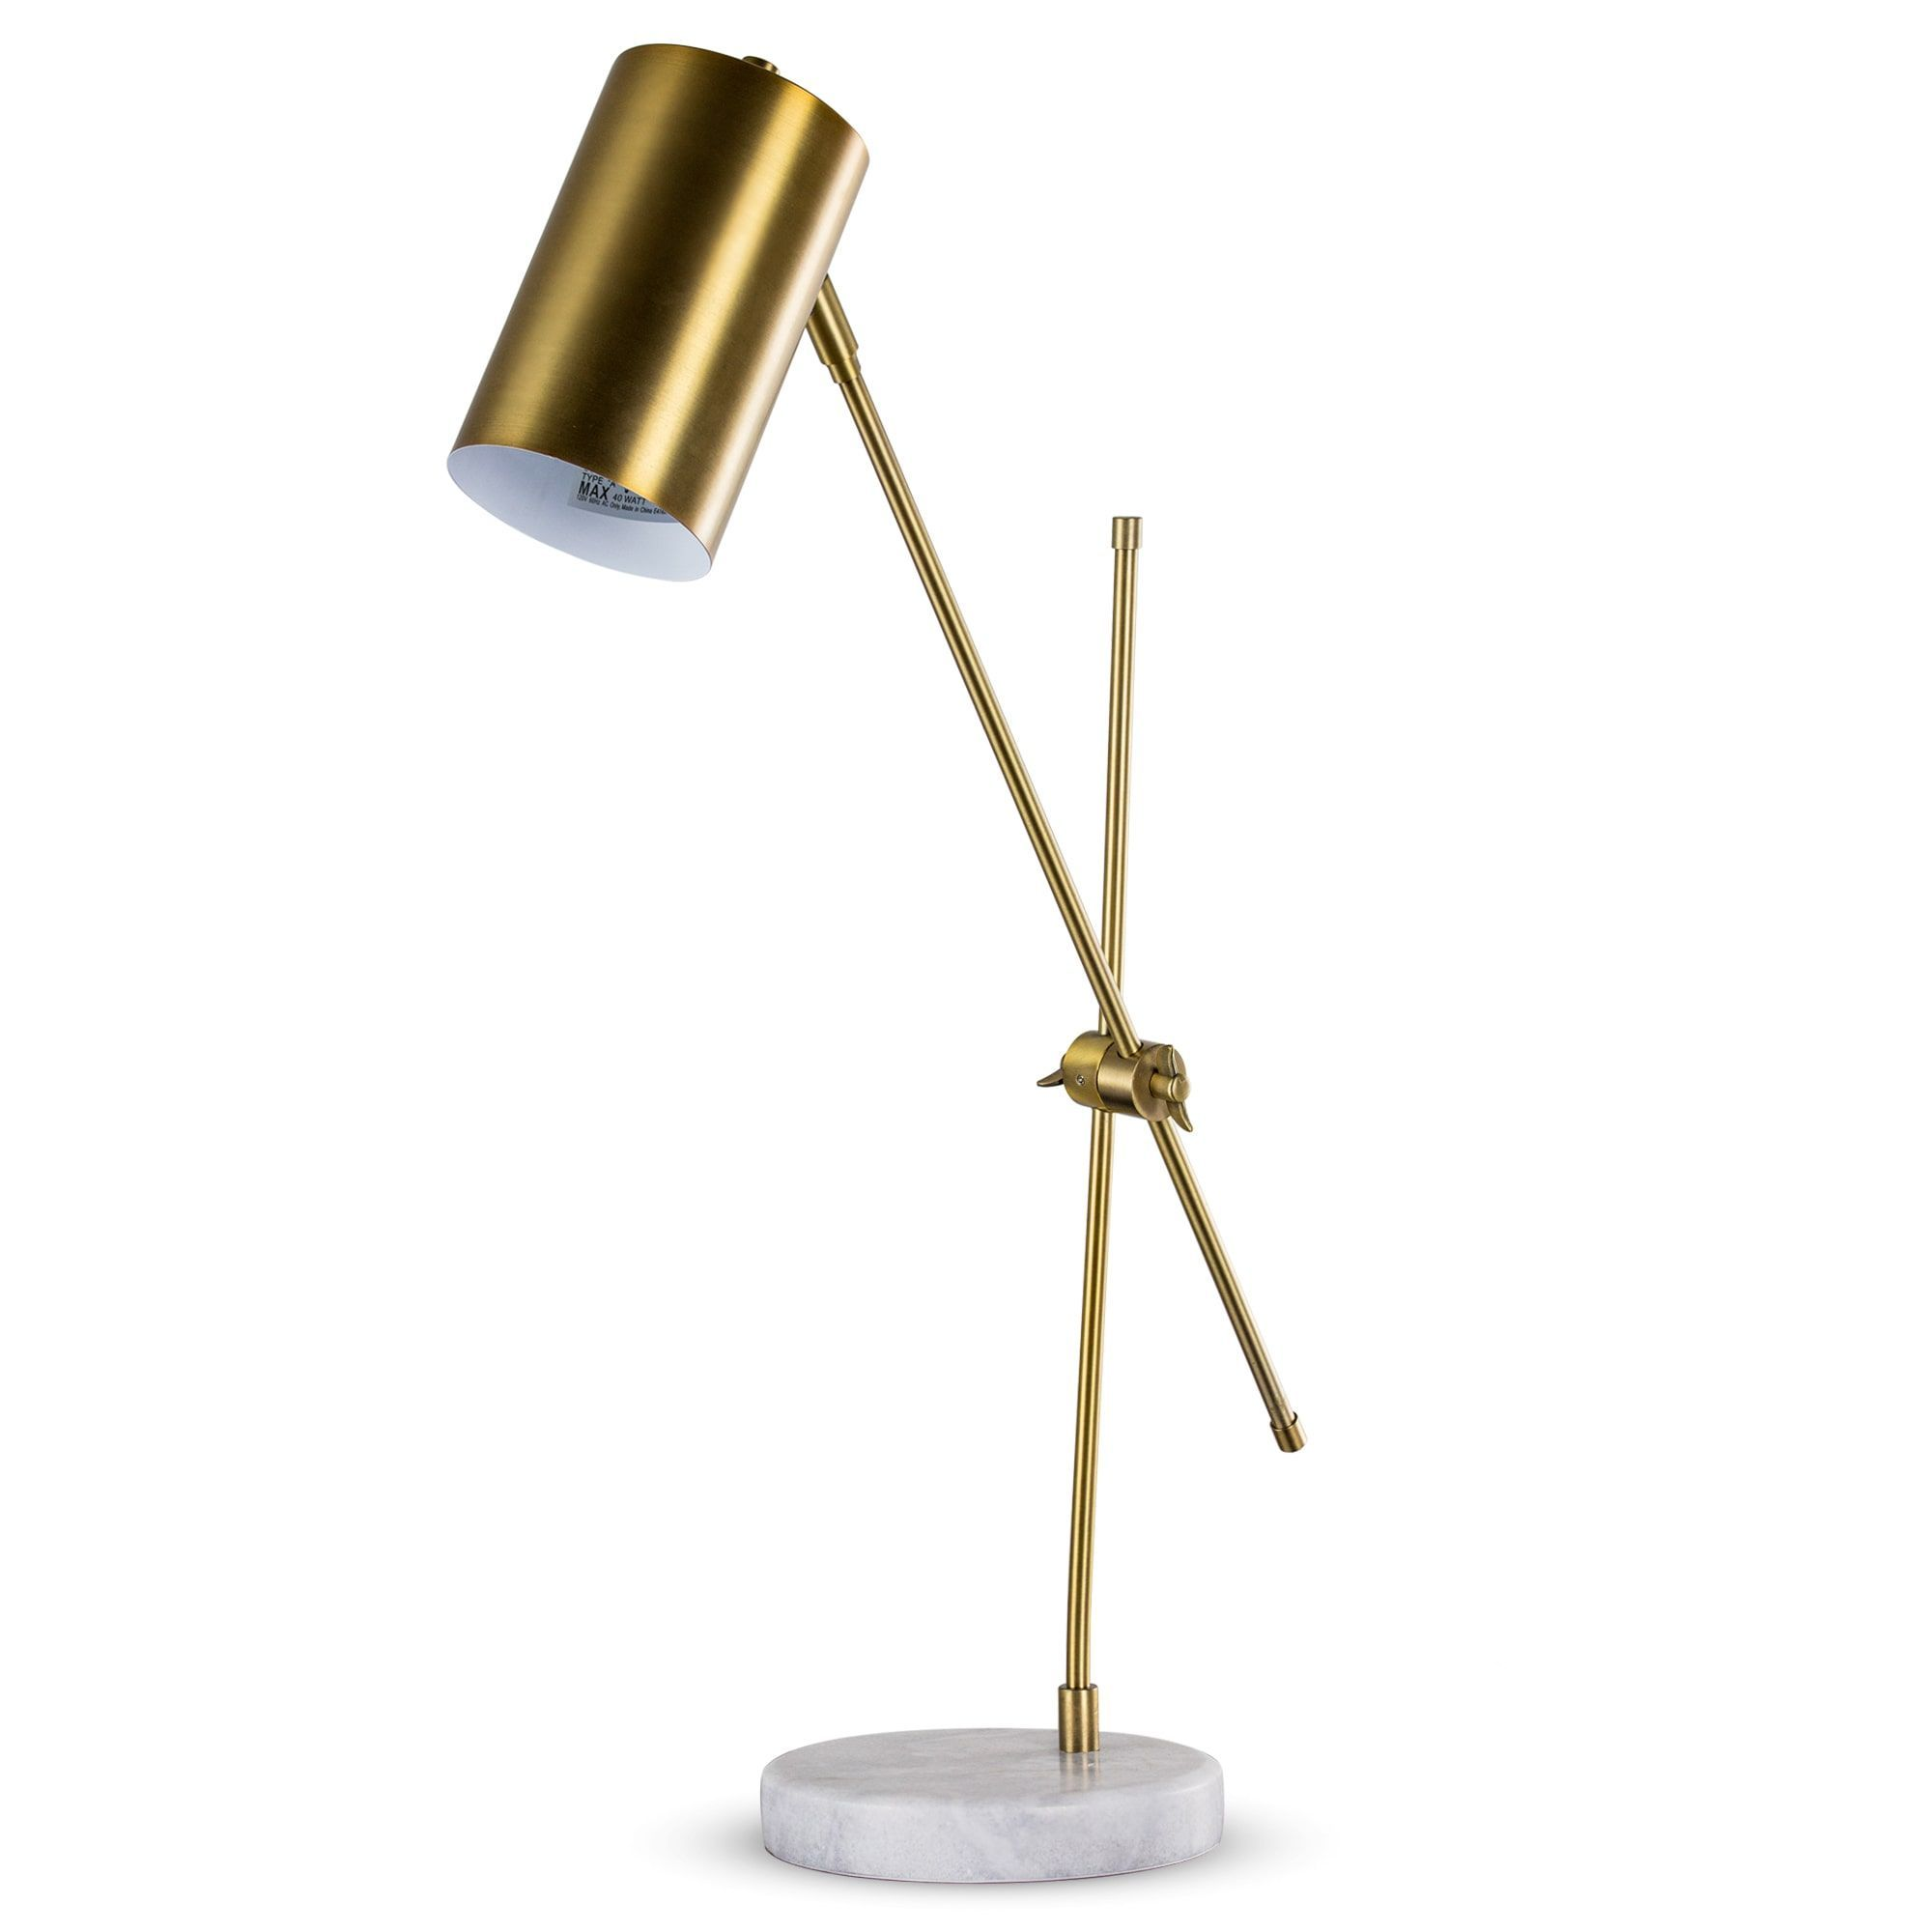 inch cfm cyan and lamp finish item black adjustable in angleton high desk bronze capitol design lighting shown